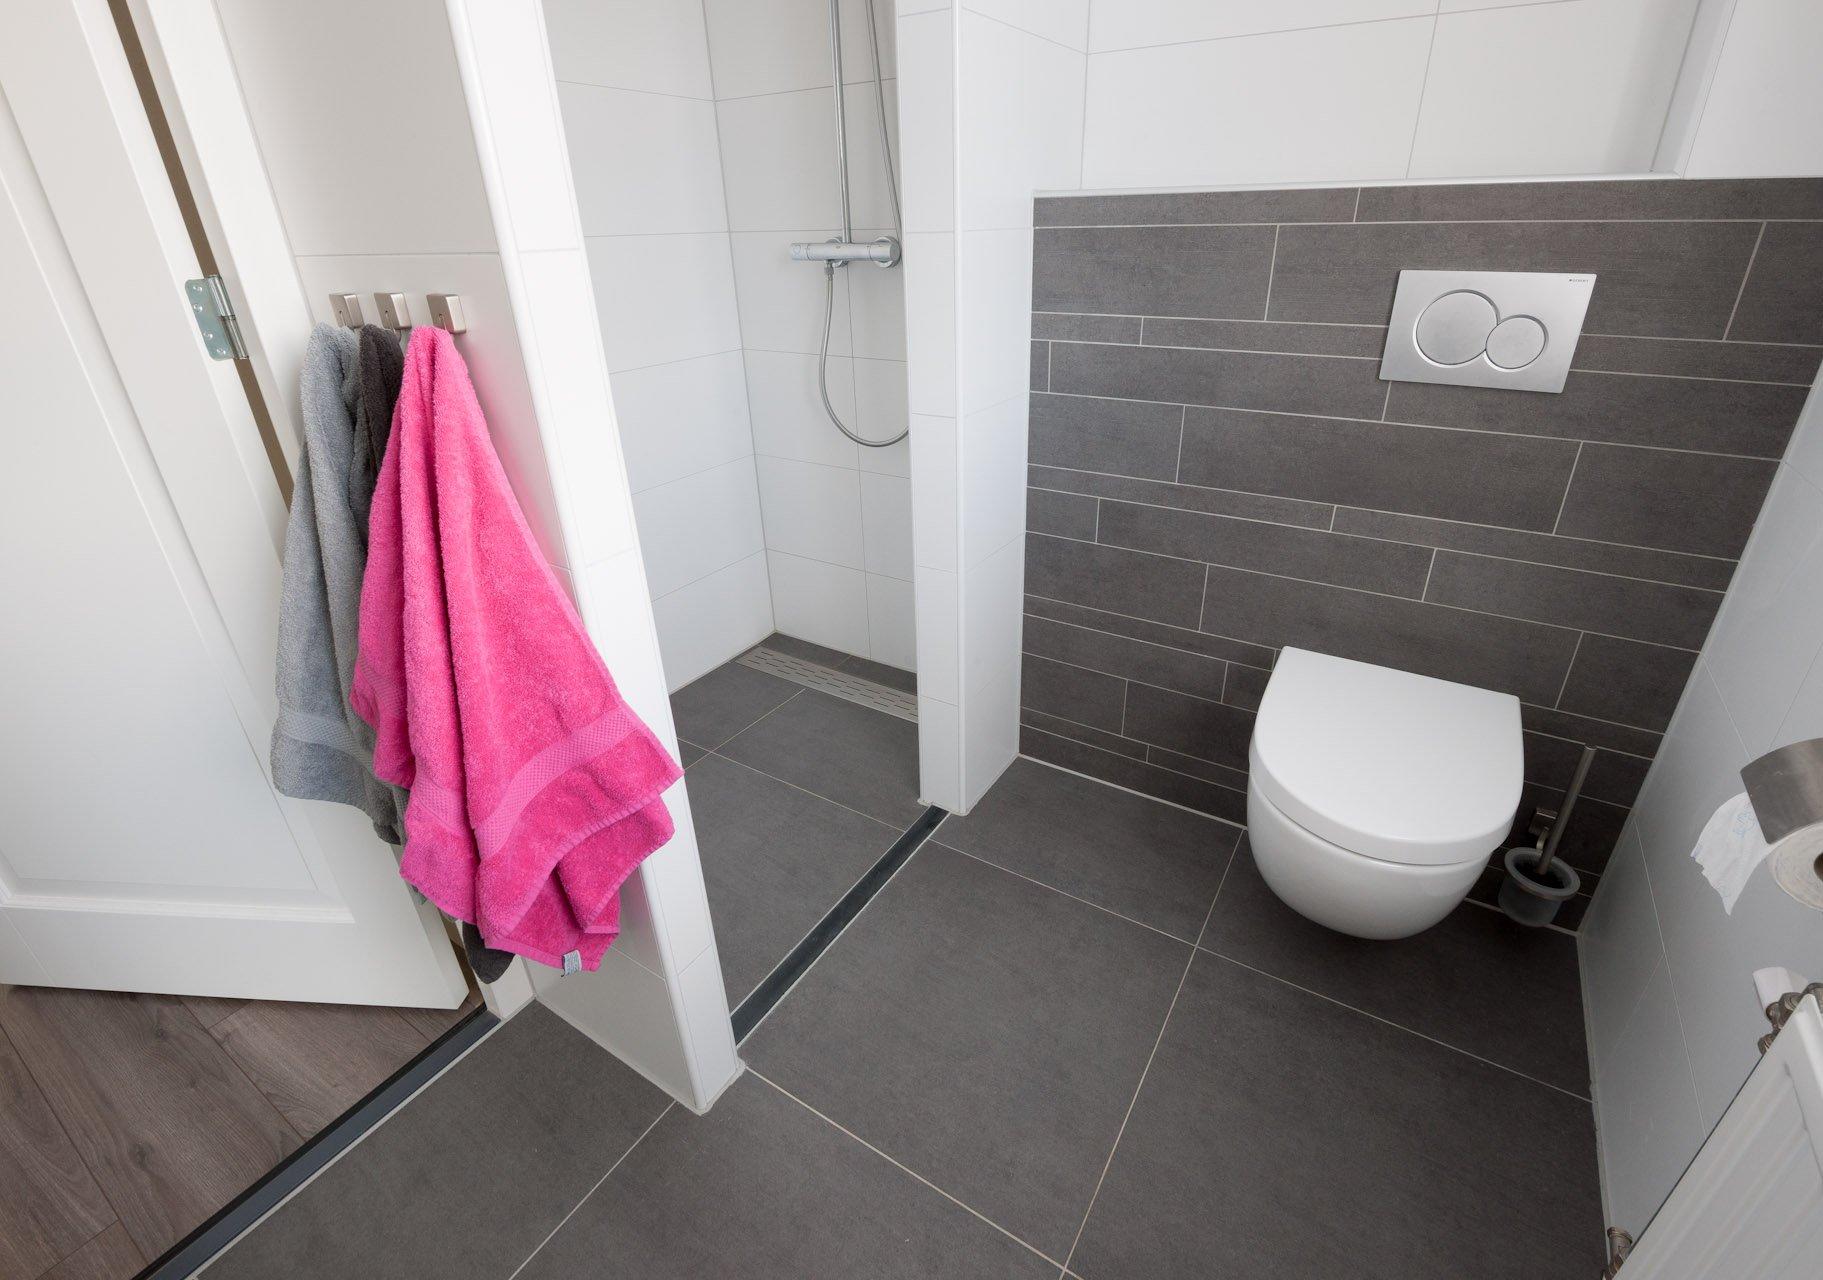 Wandtegels Badkamer Antraciet : Wandtegels badkamer kroon vloer in steen